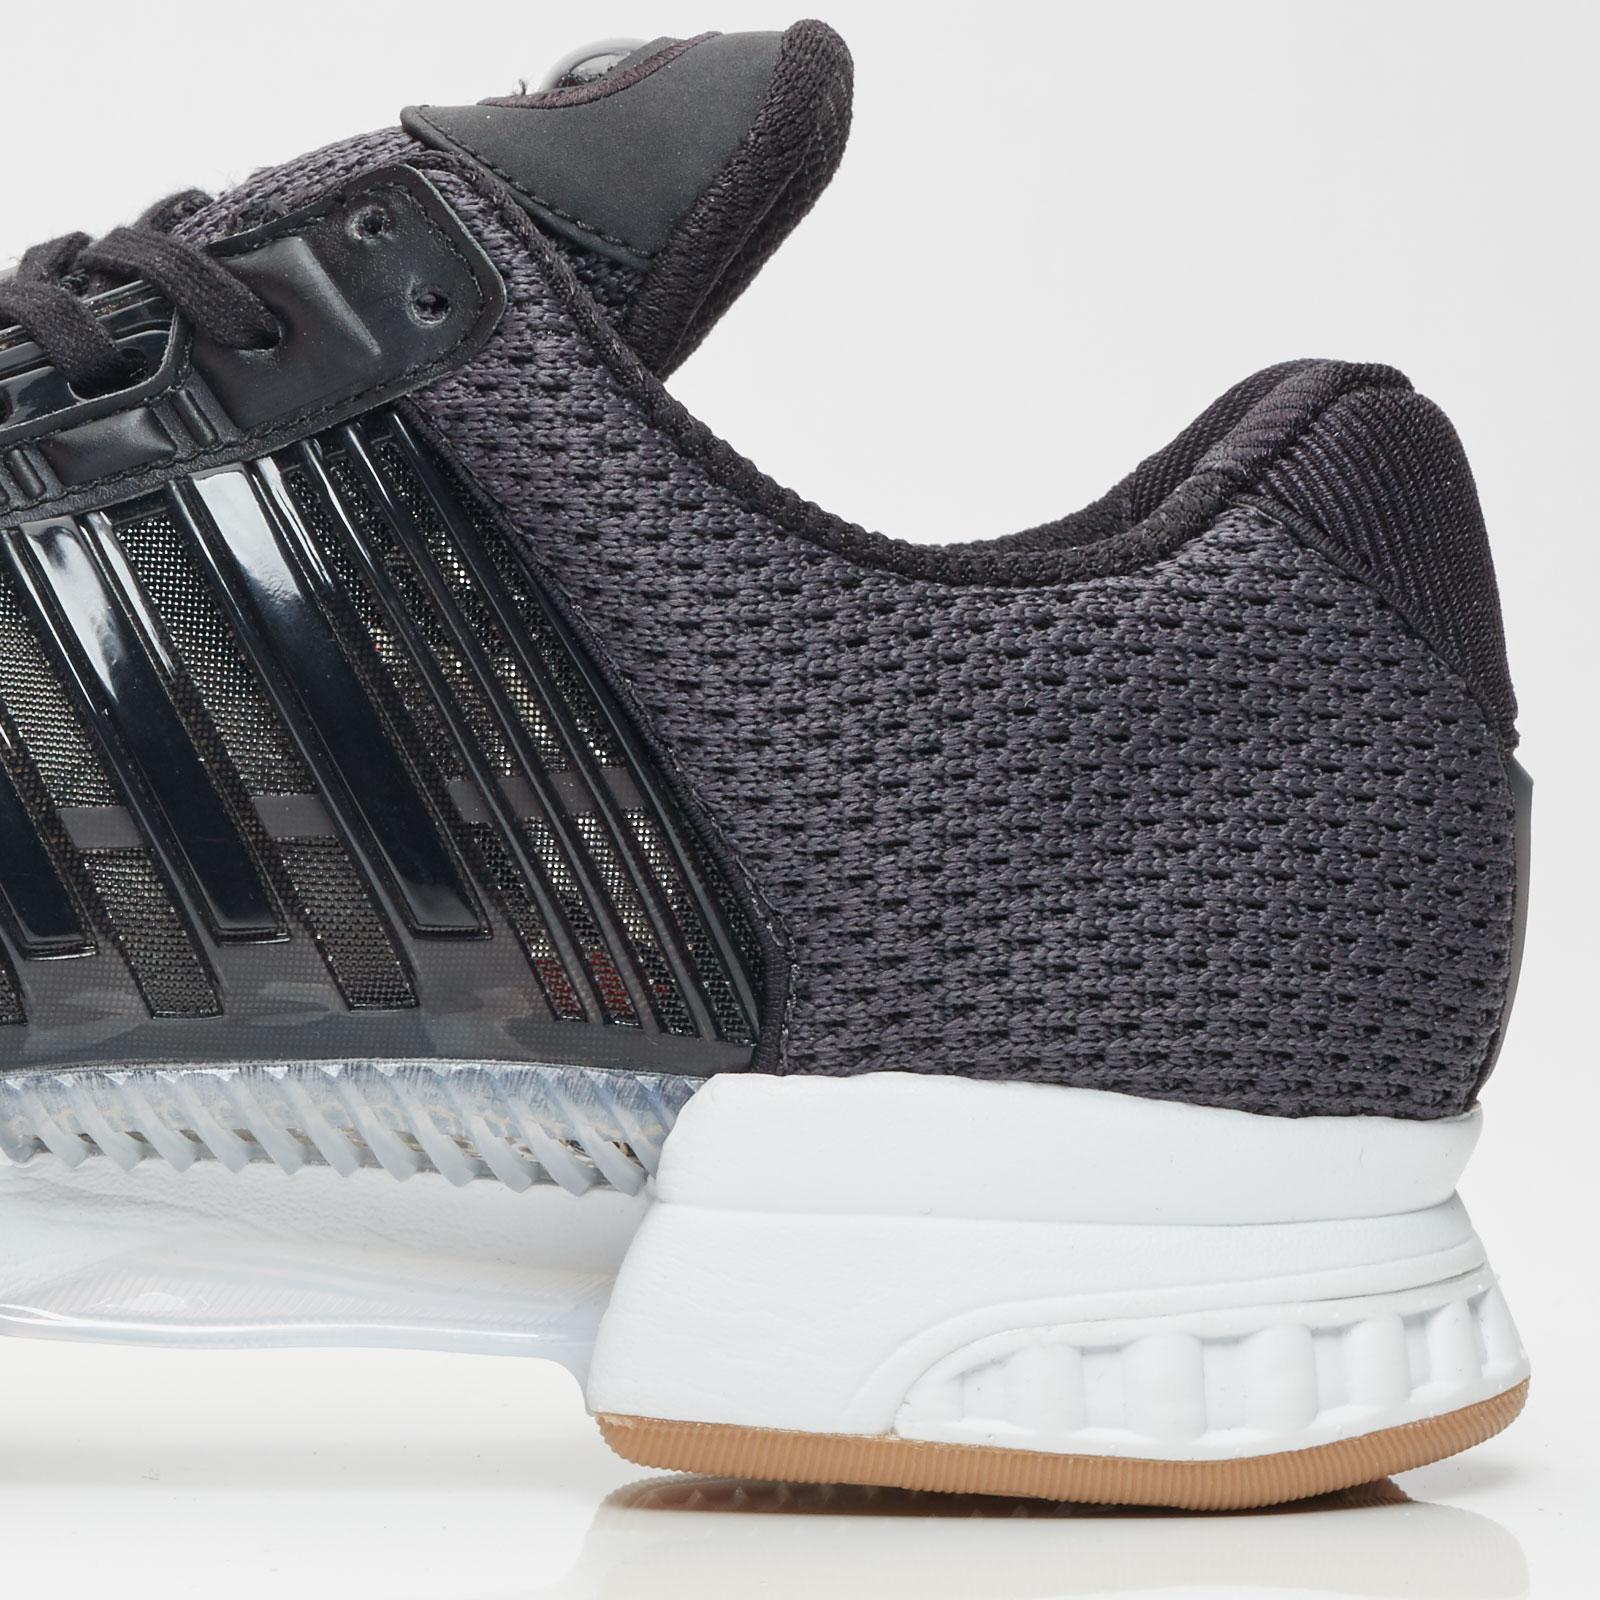 adidas Climacool 1 - Ba7164 - SNS   sneakers & streetwear online ...